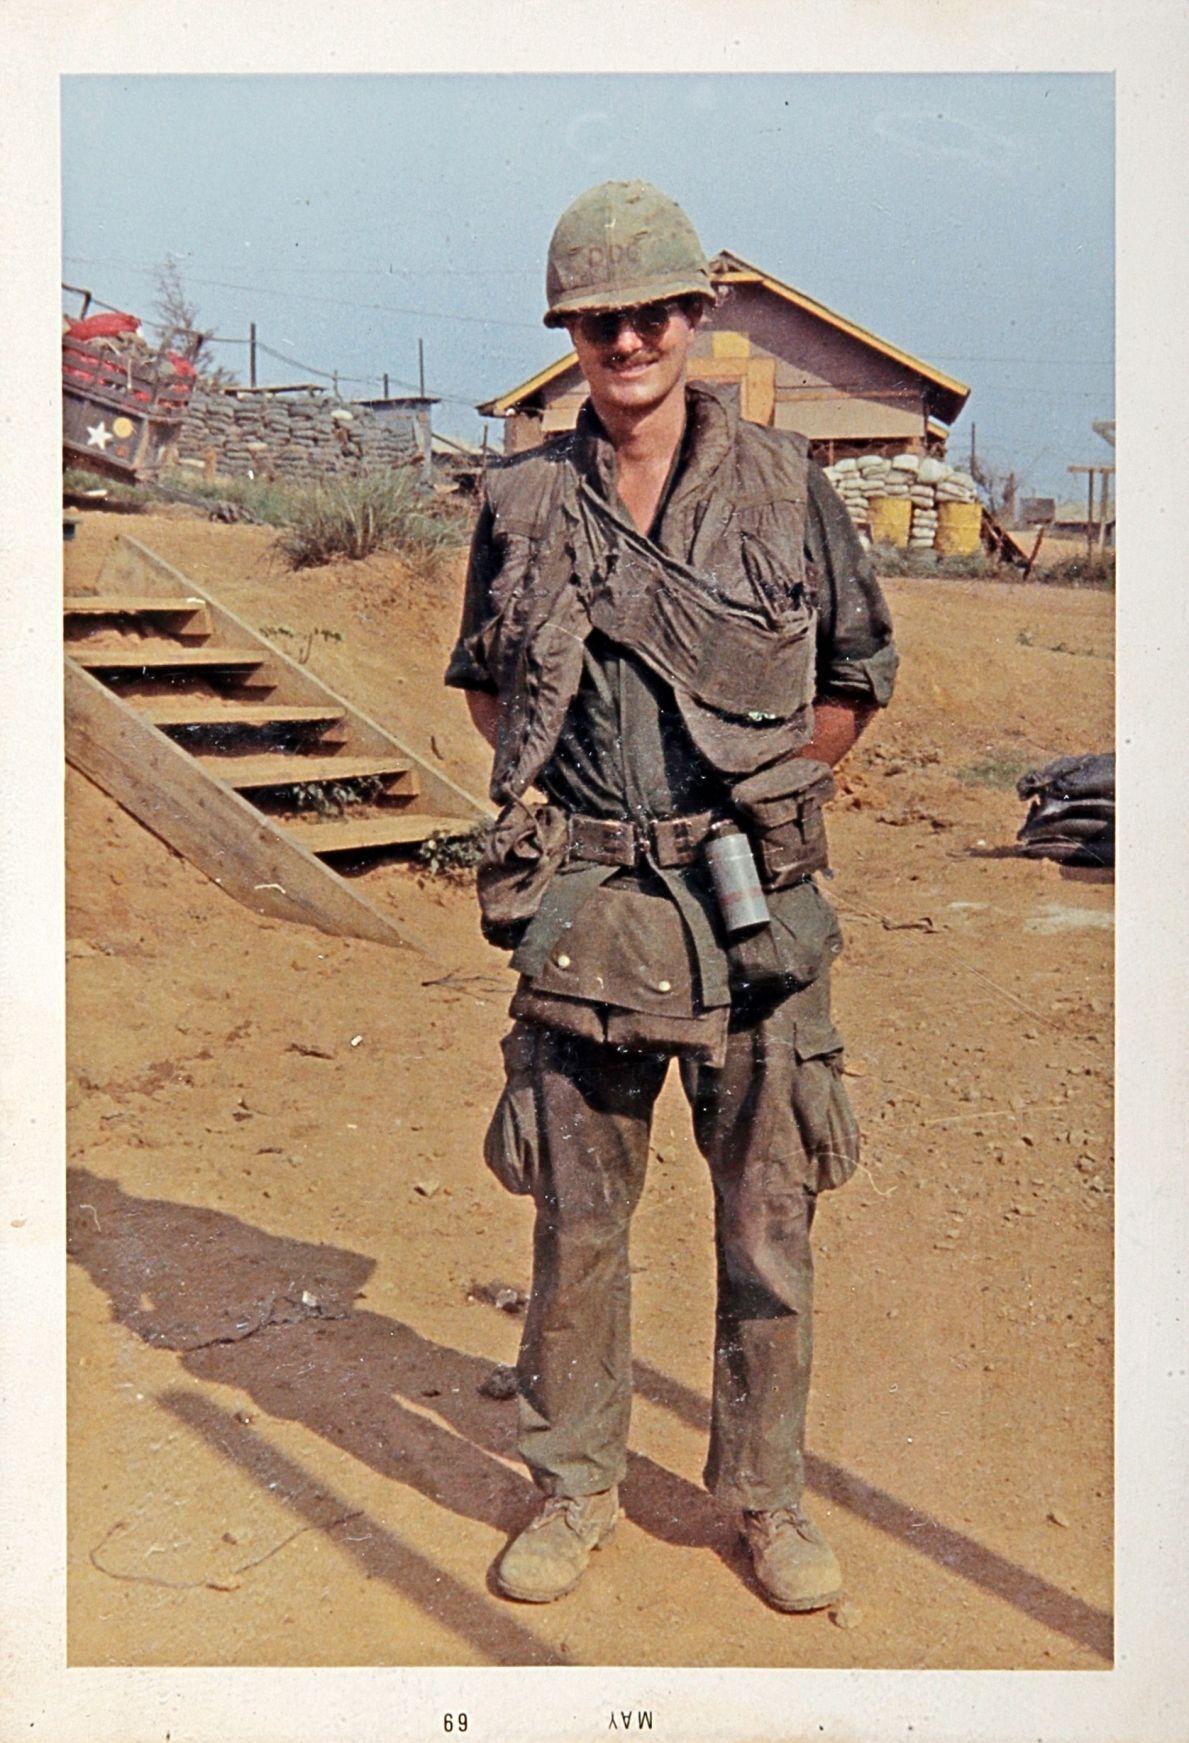 Vietnam Veteran Clint Whitmer Service Photos May 1969